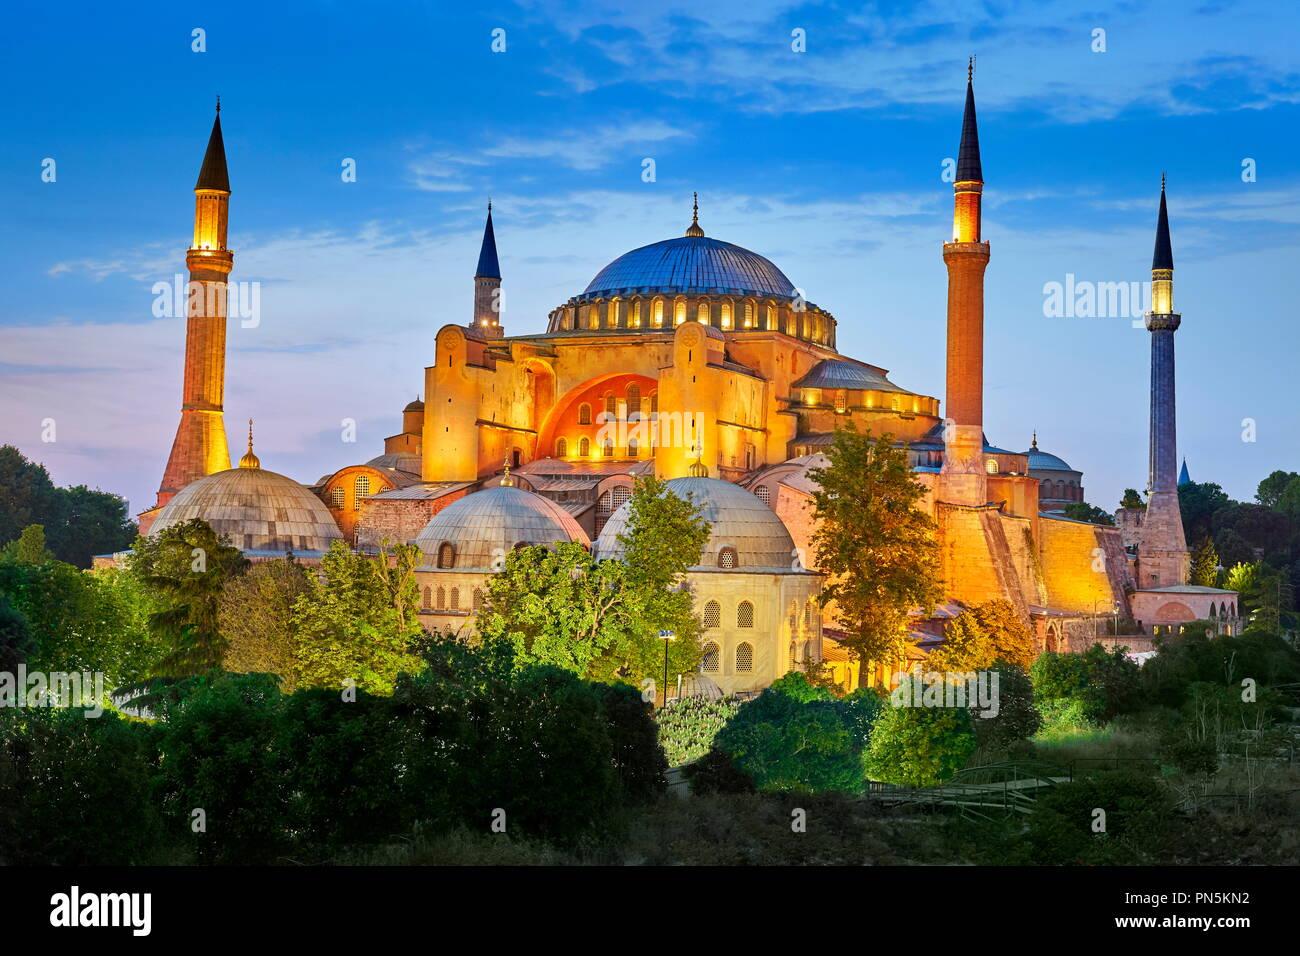 Hagia Sophia alla luce della sera, Ayasofya, Istanbul, Turchia Immagini Stock